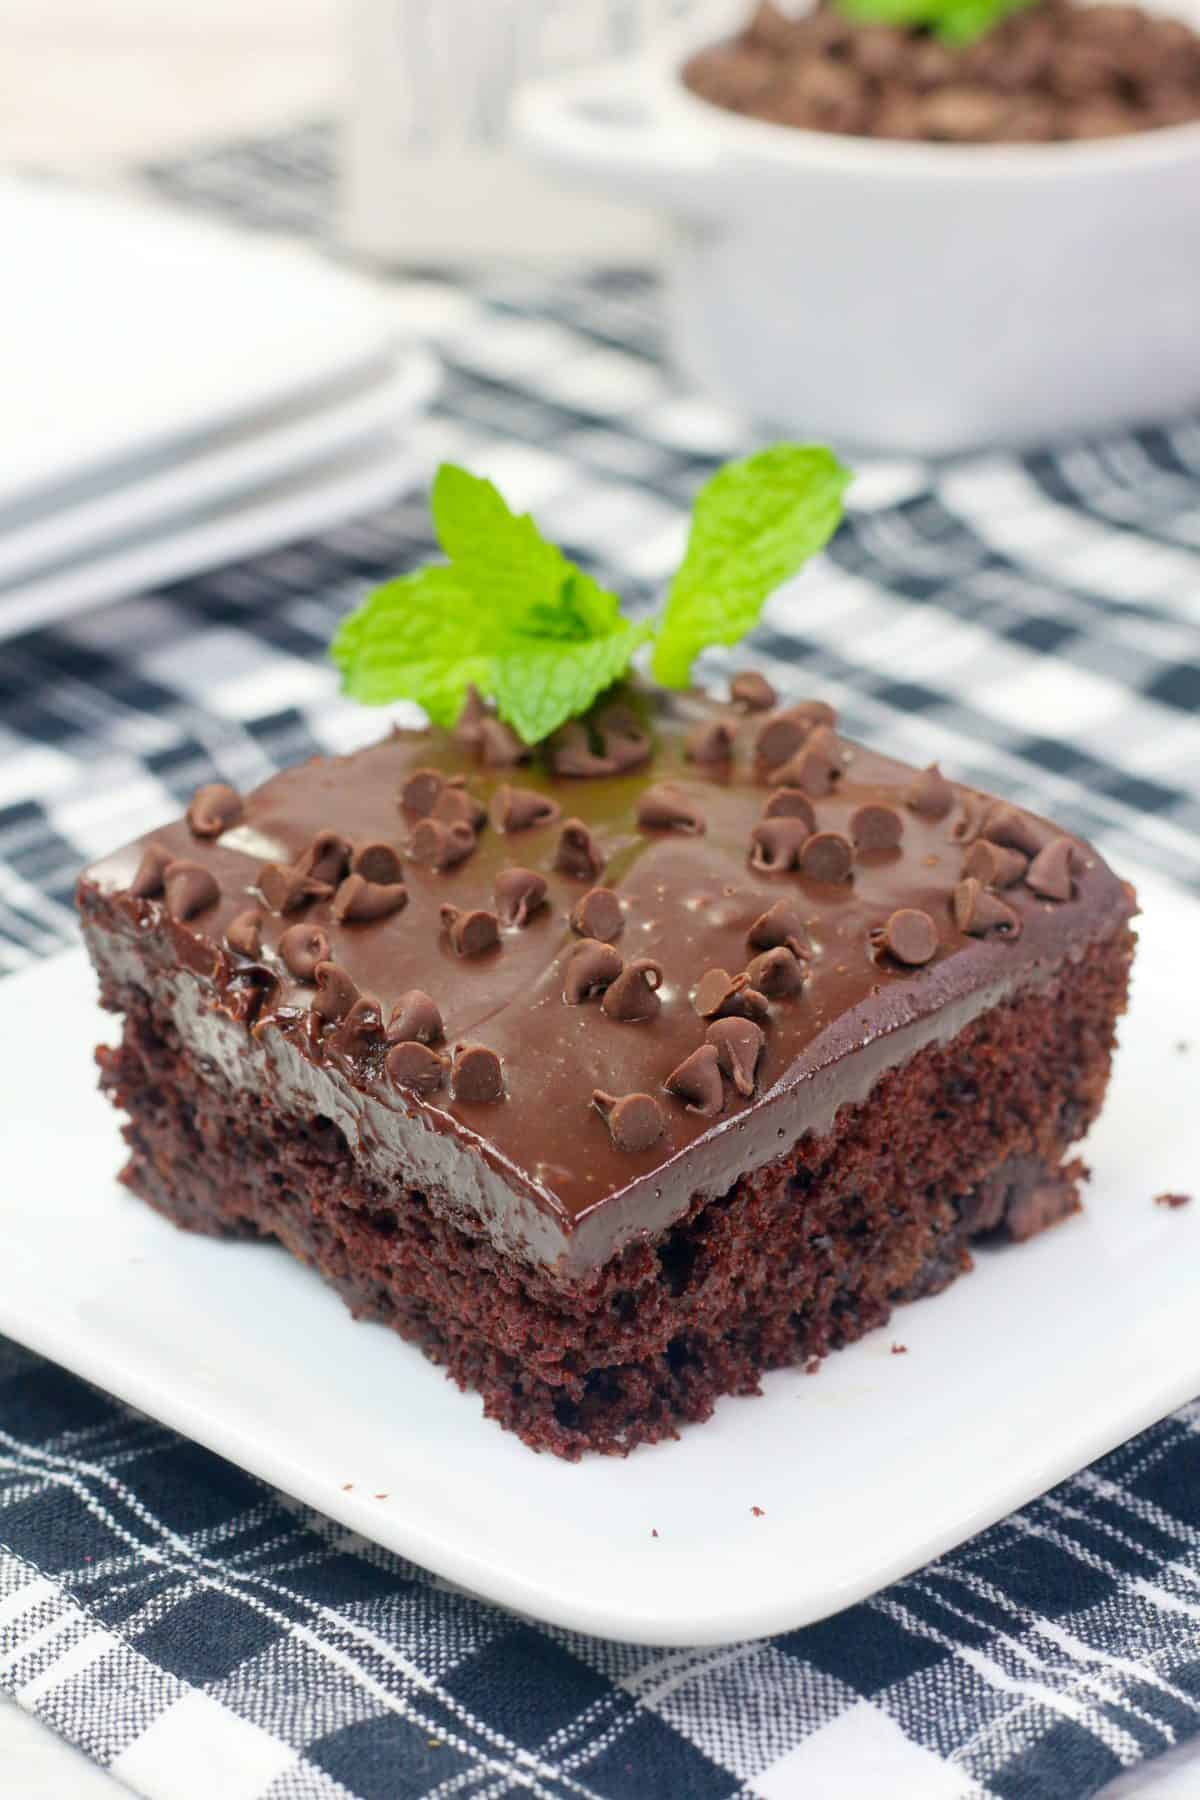 Chocolate Ganache Frosting, Chocolate Mint Cake